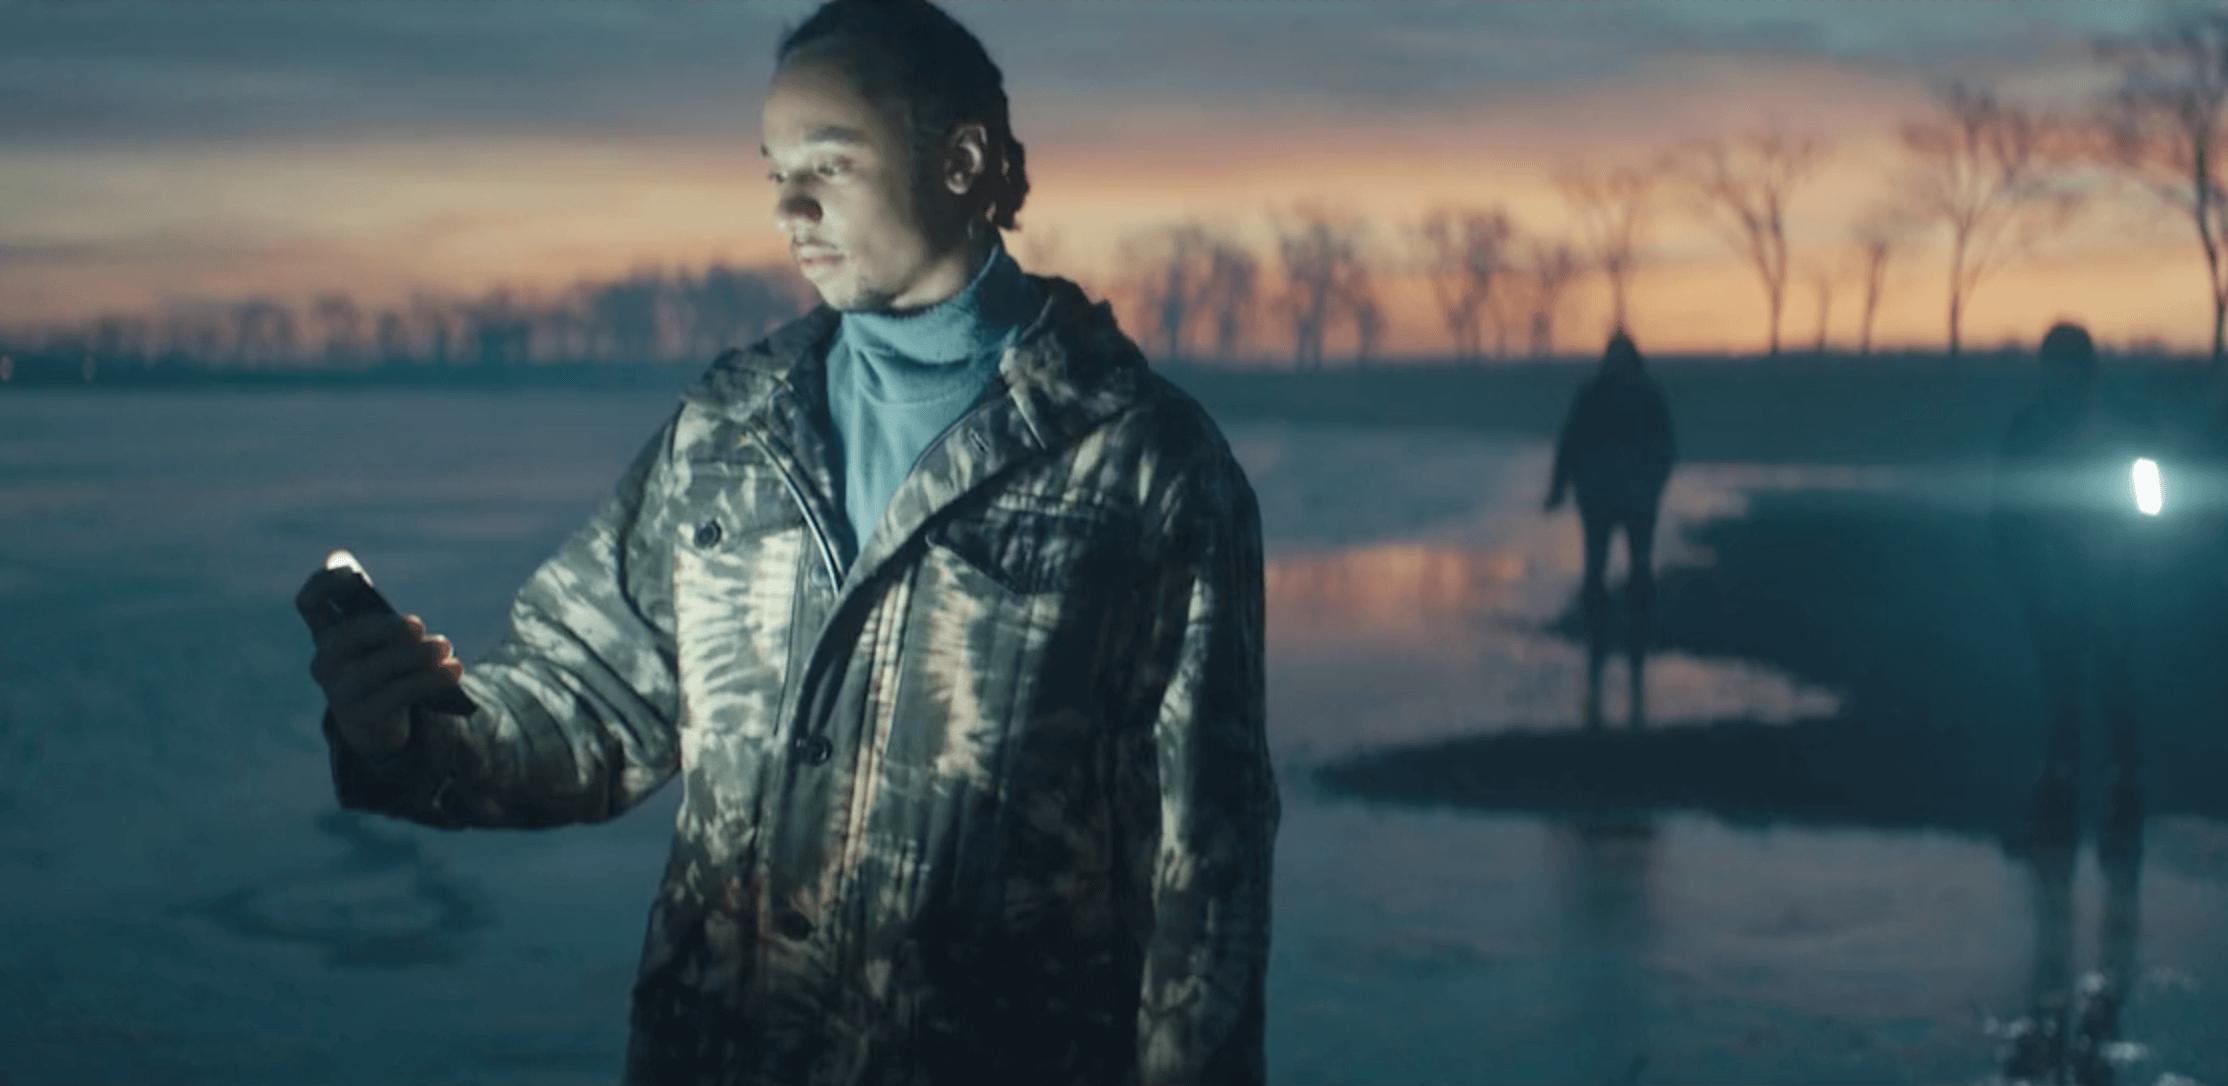 "Film ""Now You"" for the Austrian Telecom Provider A1 directed by Matthäus Bussmann"